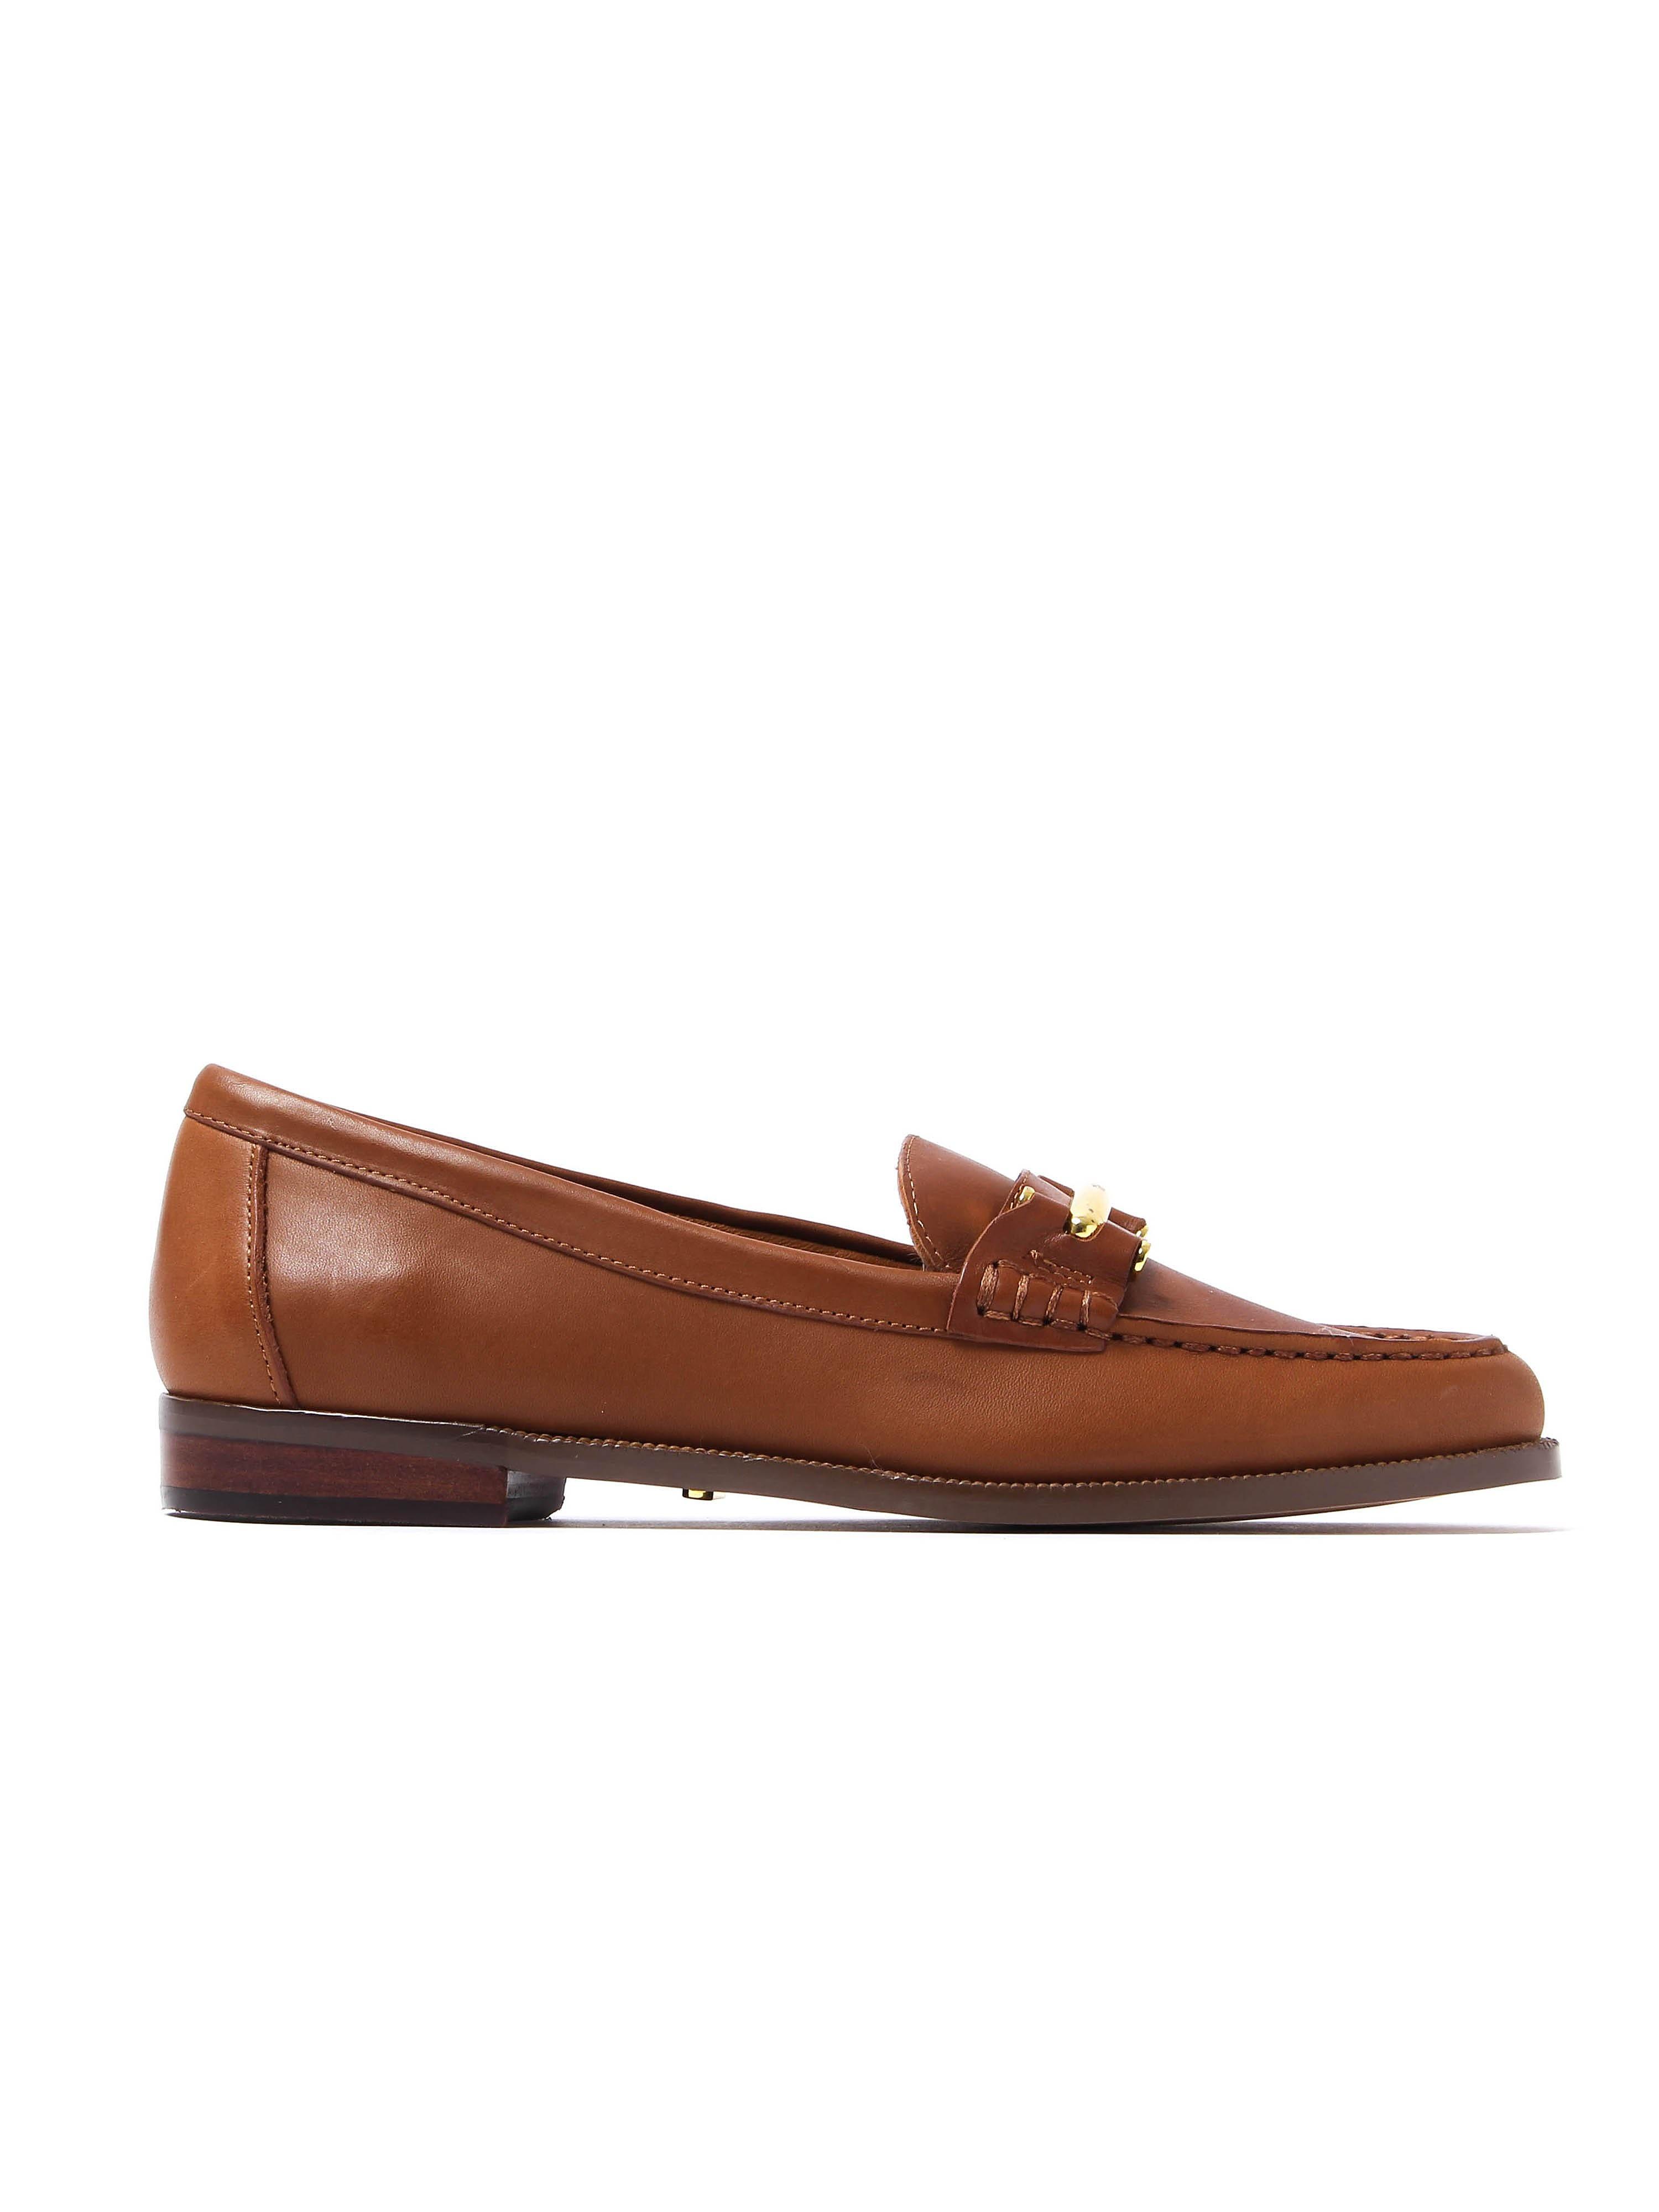 Lauren Ralph Lauren Women's Flynn Loafers - Tan Saddle Leather